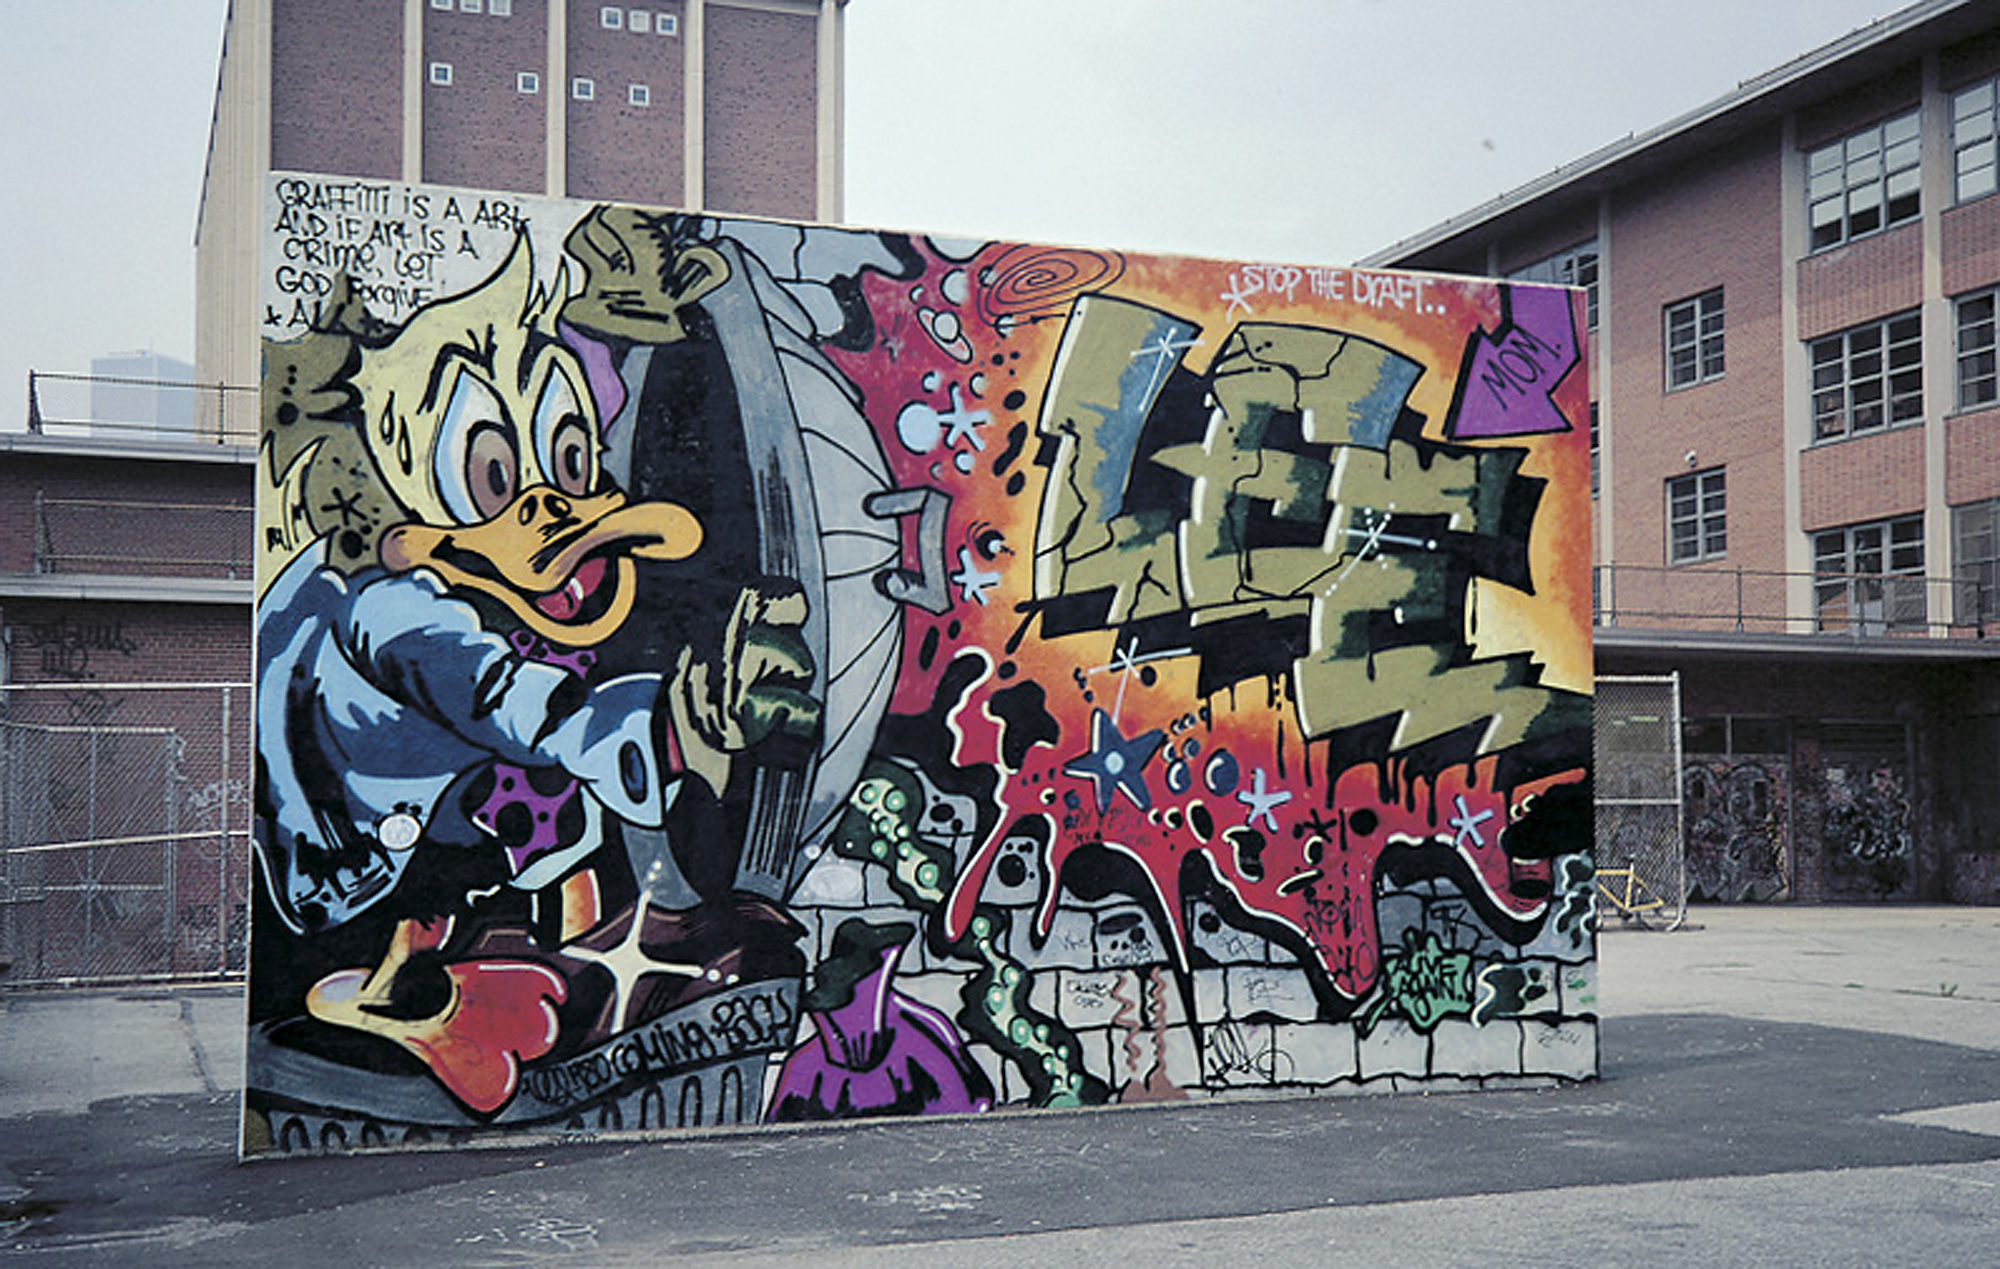 Is graffiti art or crime? Essay Sample